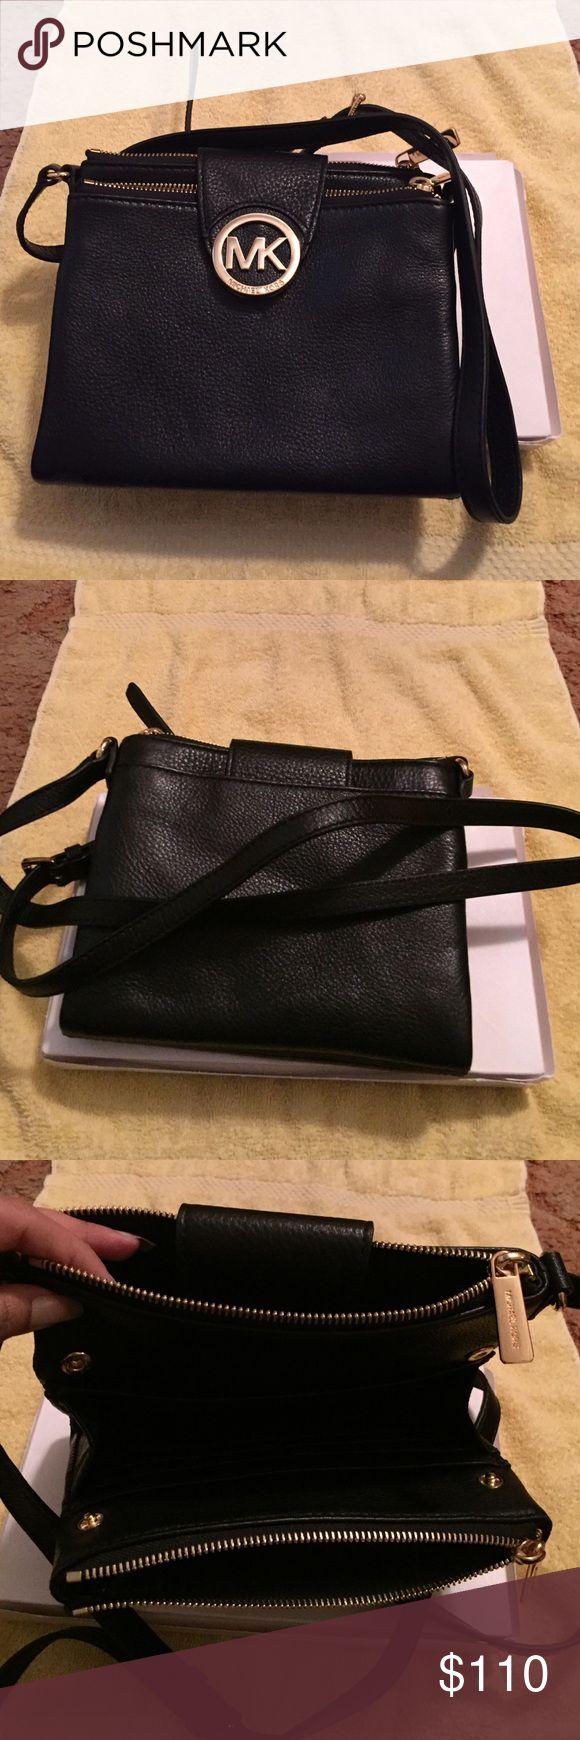 Michael Kors Large Crossbody Handbag black large crossbody purse wear once. Michael Kors Bags Crossbody Bags